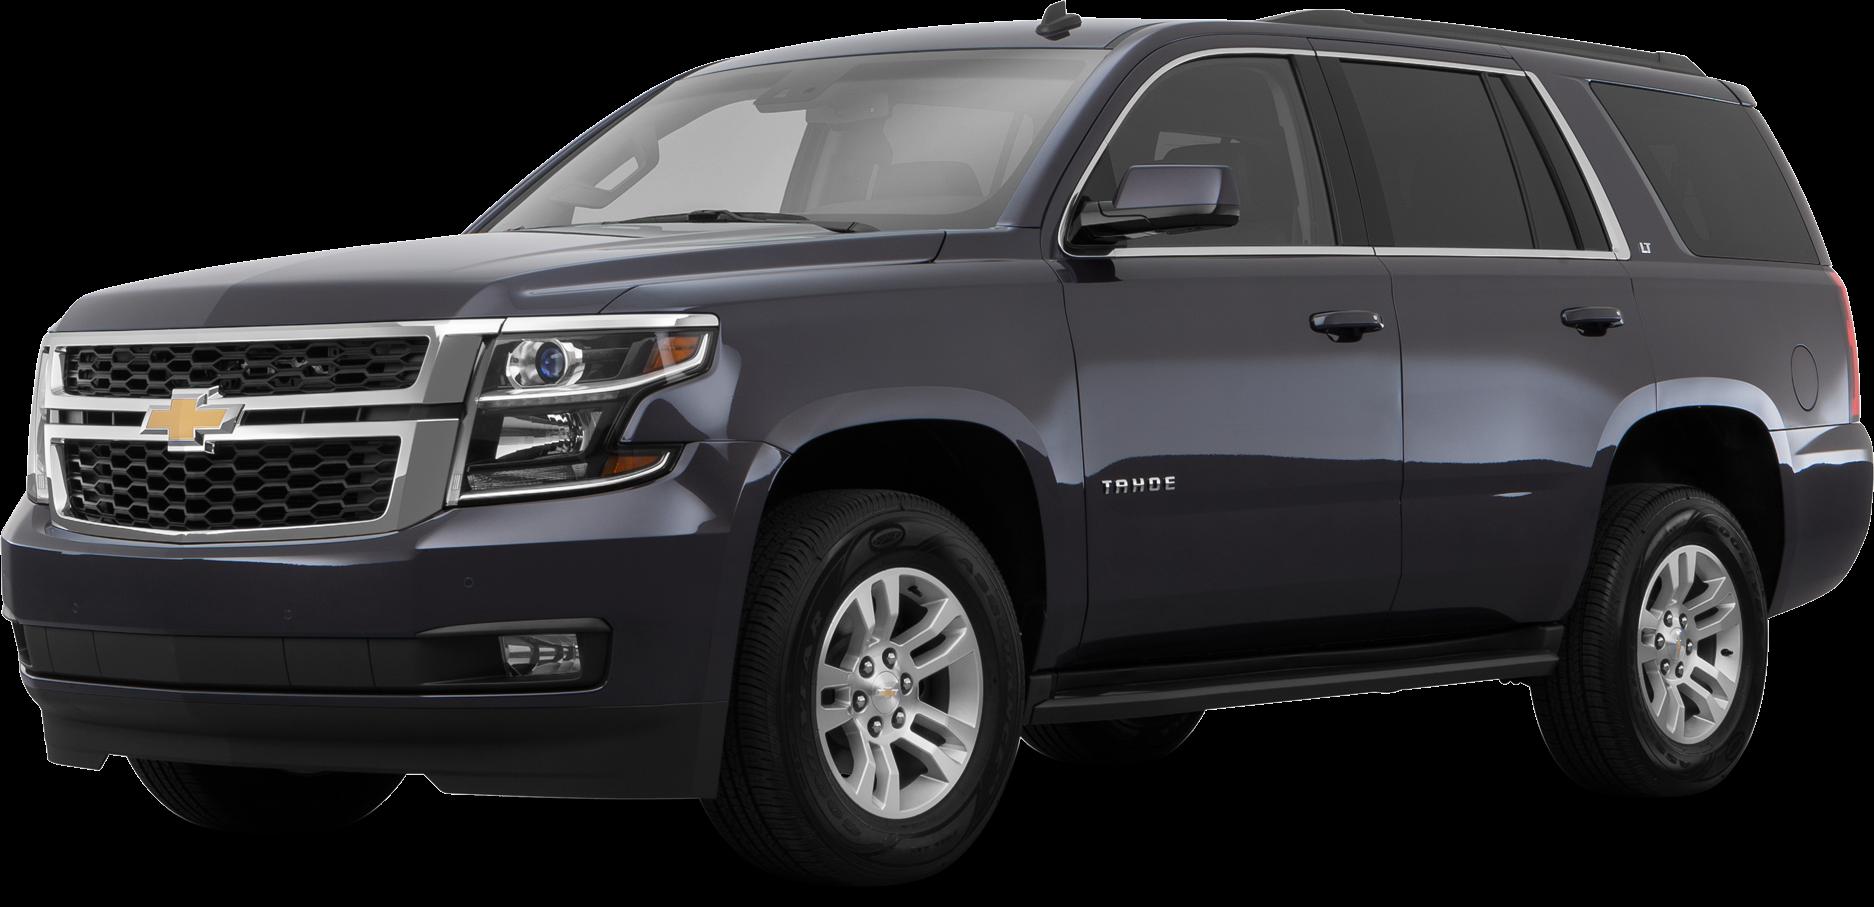 2015 Chevrolet Suburban | Pricing, Ratings, Expert Review | Kelley